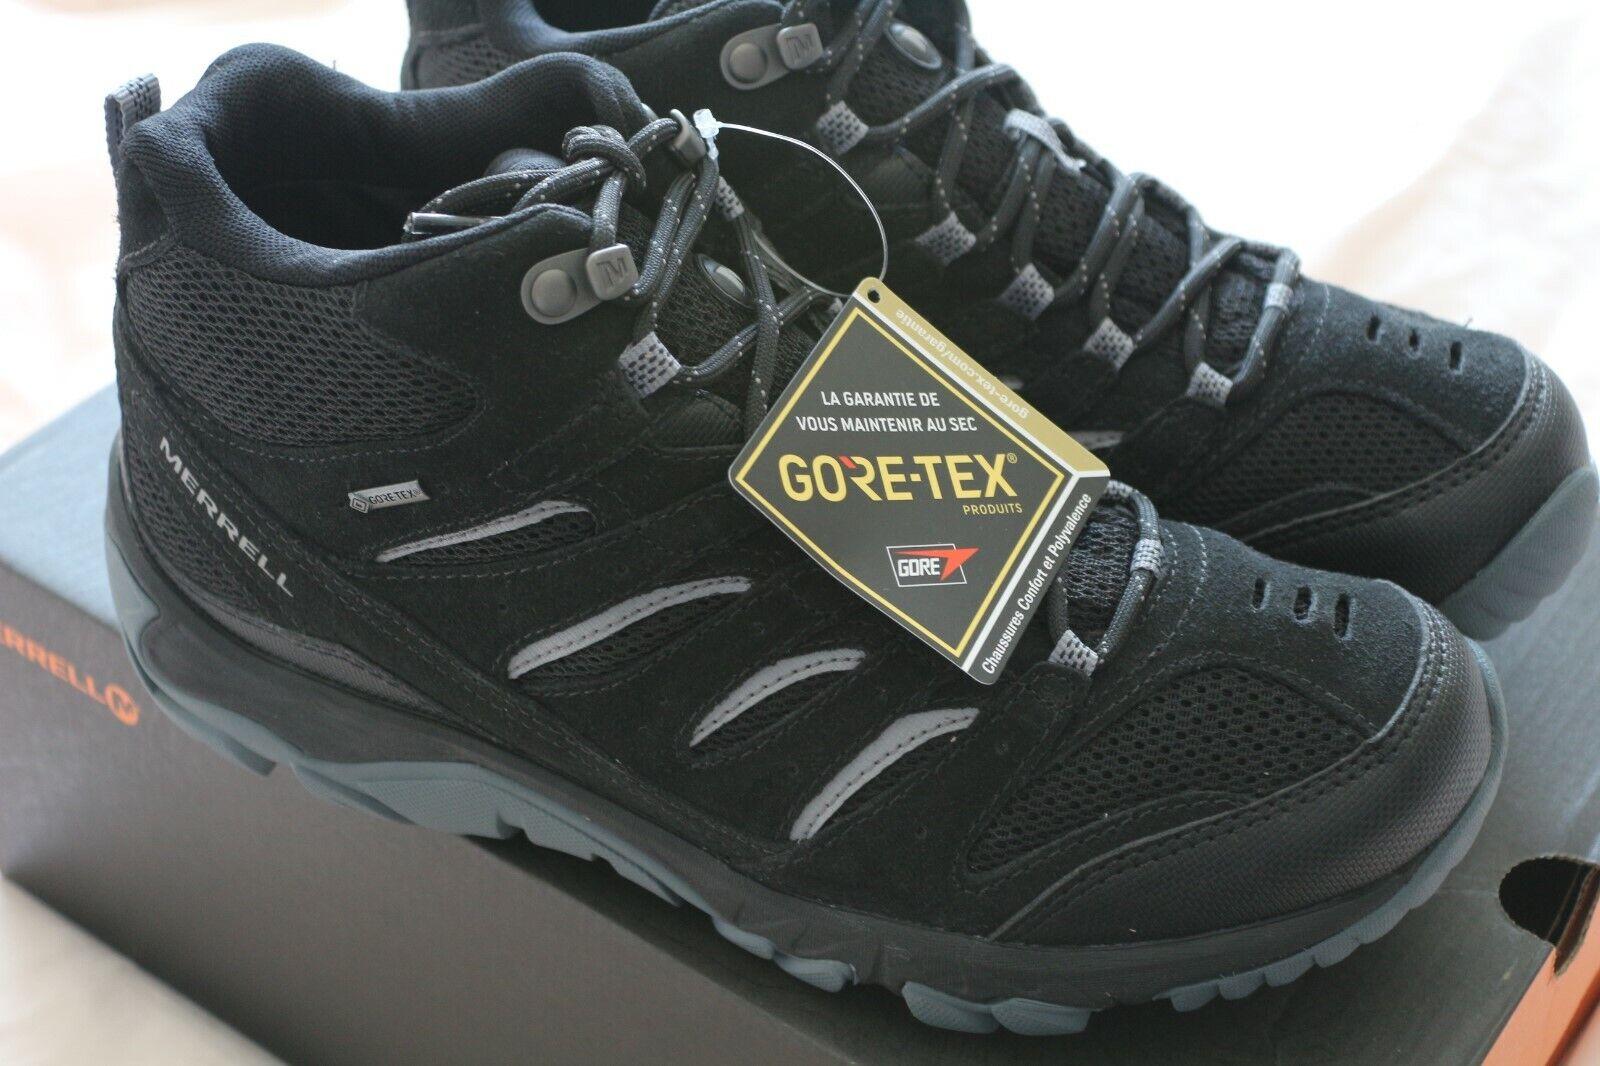 MERRELL PINE MID VENT GTX GORE-TEX HIKING TREKKING Stiefel UK 8 (US 8.5, EU 42)